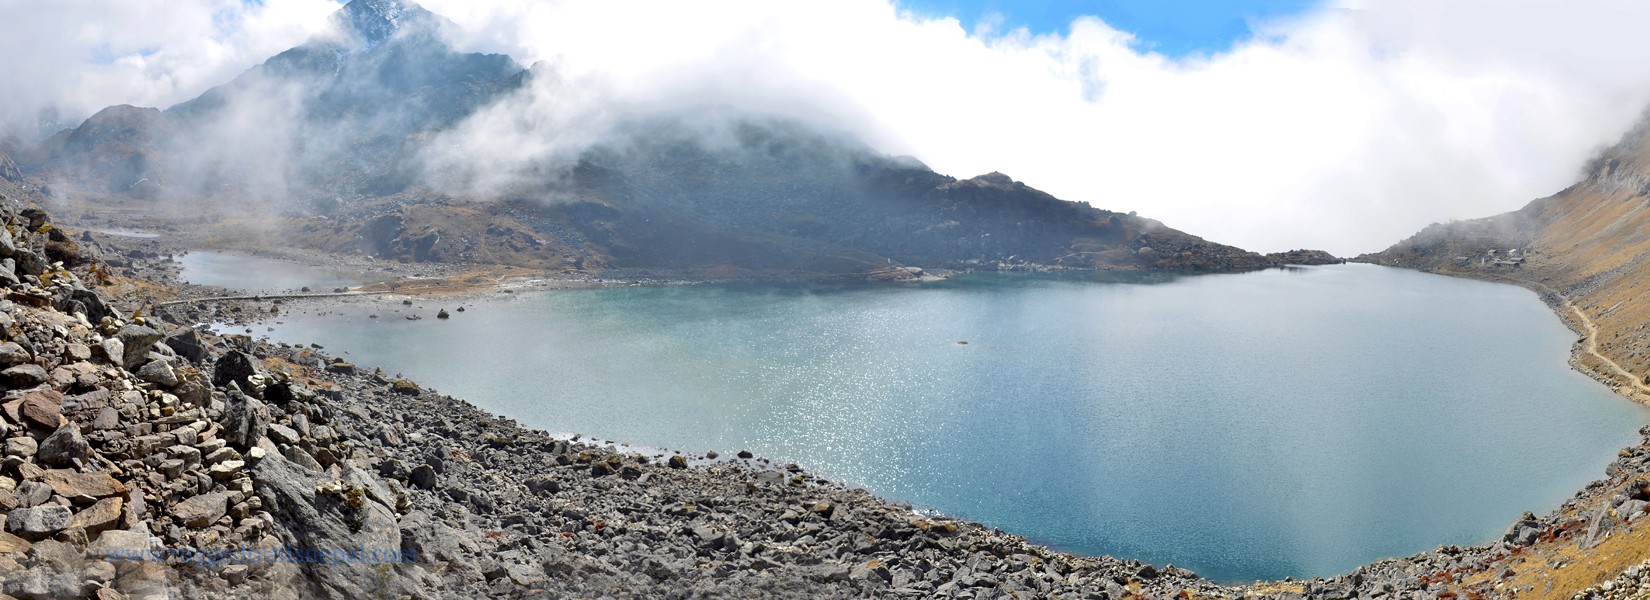 nepal trek route langtang